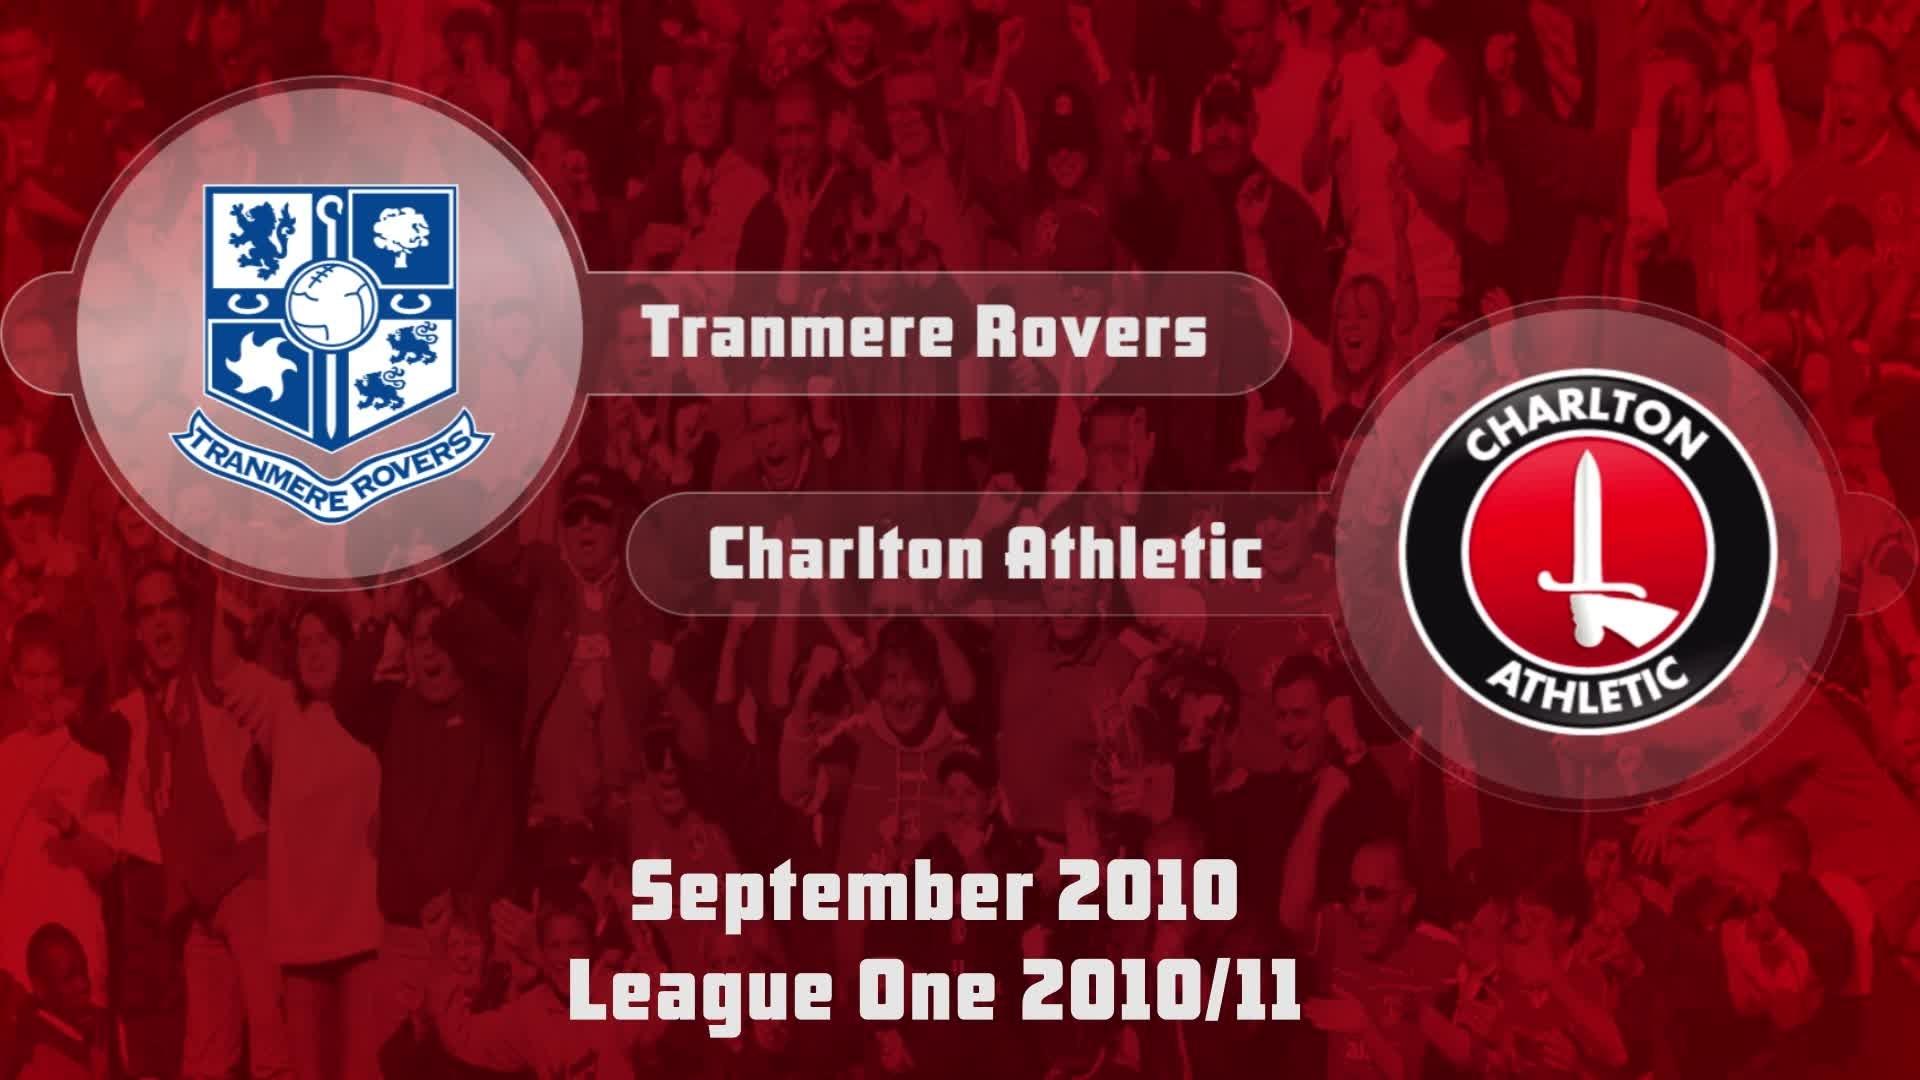 09 HIGHLIGHTS | Tranmere 1 Charlton 1 (Sept 2010)